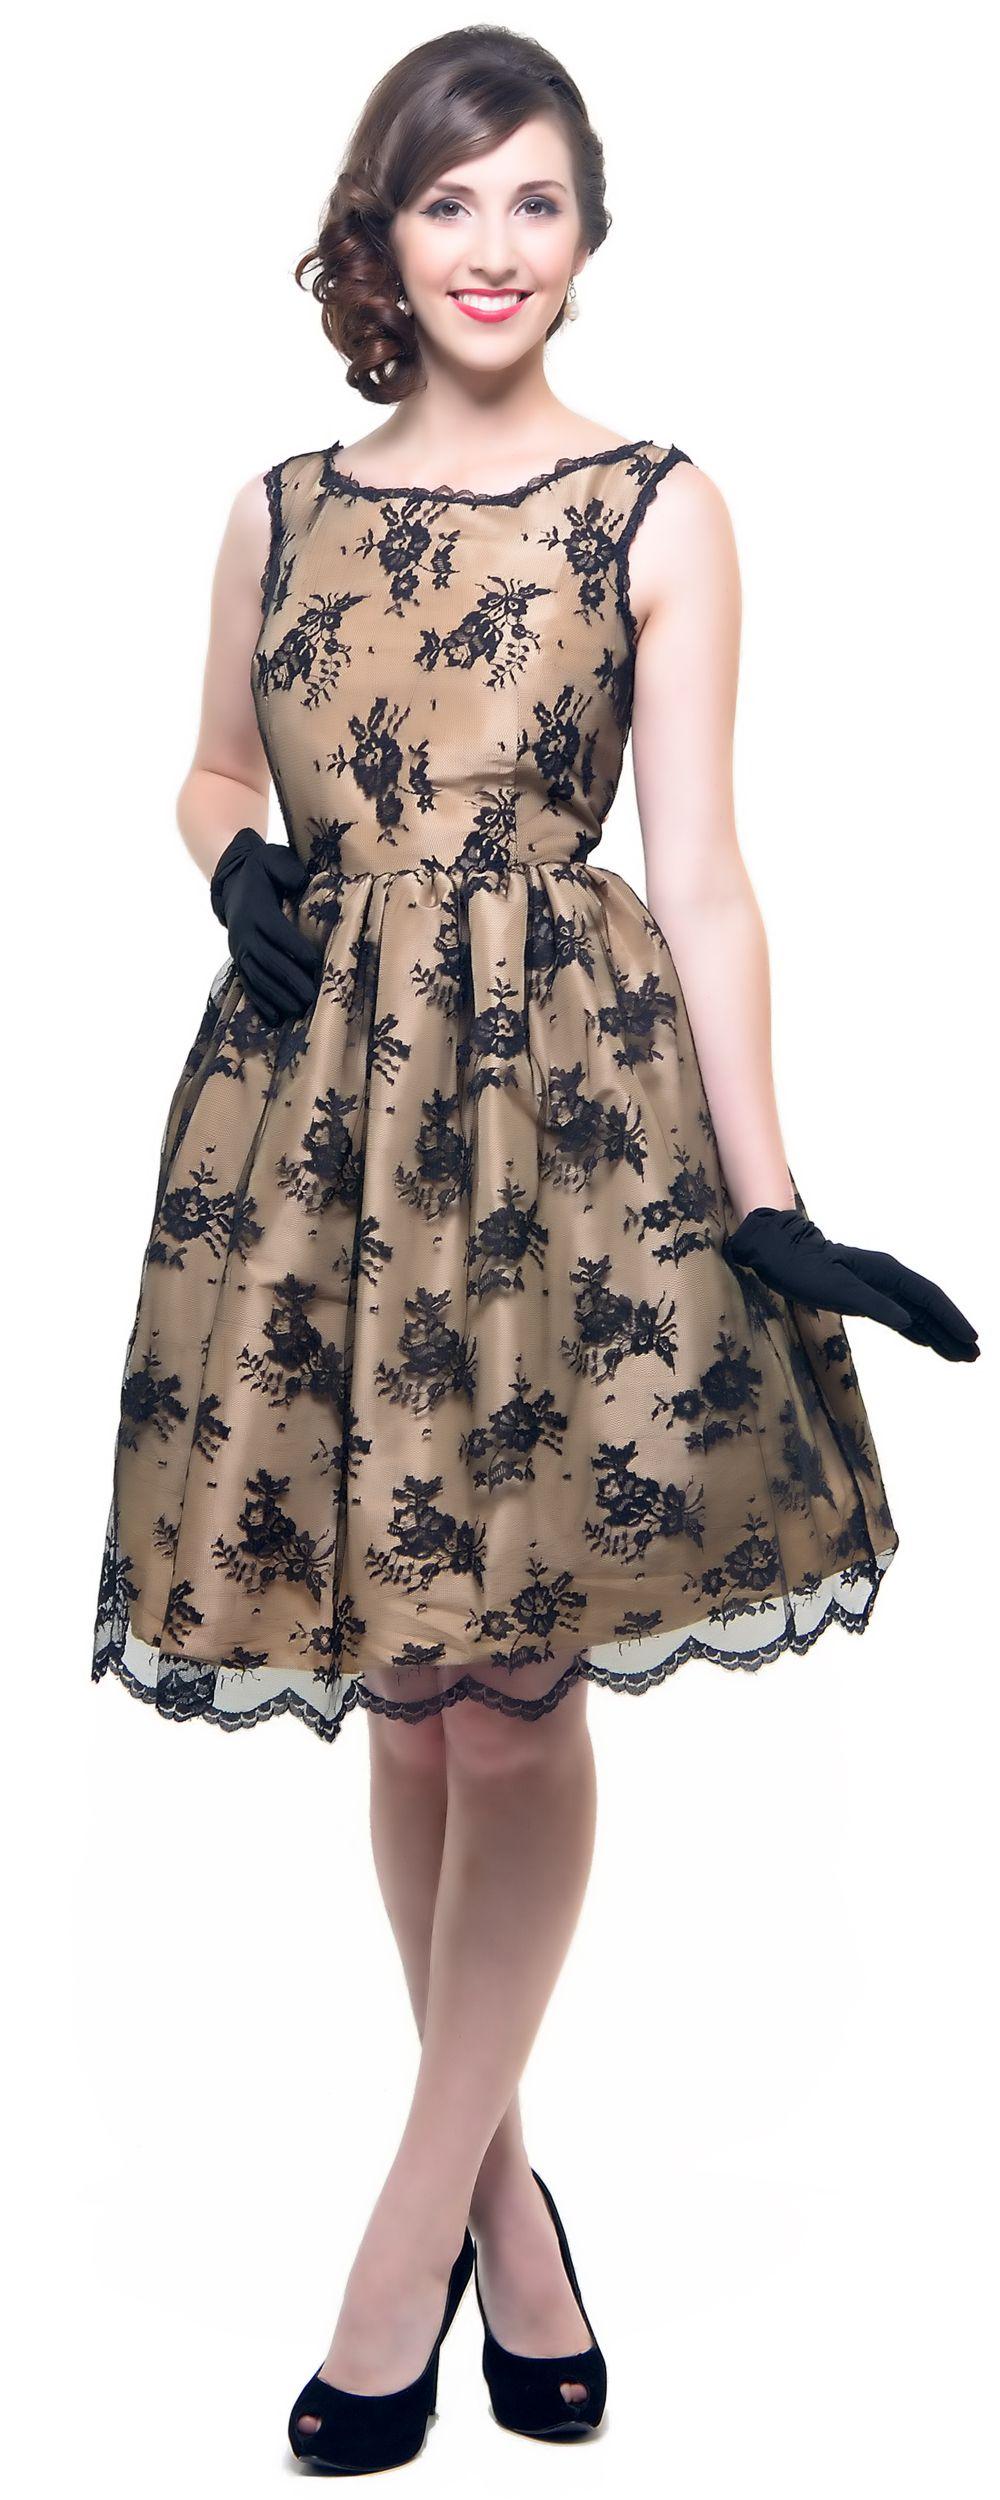 Vintage Inspired Halloween Costumes Vintage Short Dress Fifties Dress Black Lace Prom Dress [ 2500 x 1000 Pixel ]